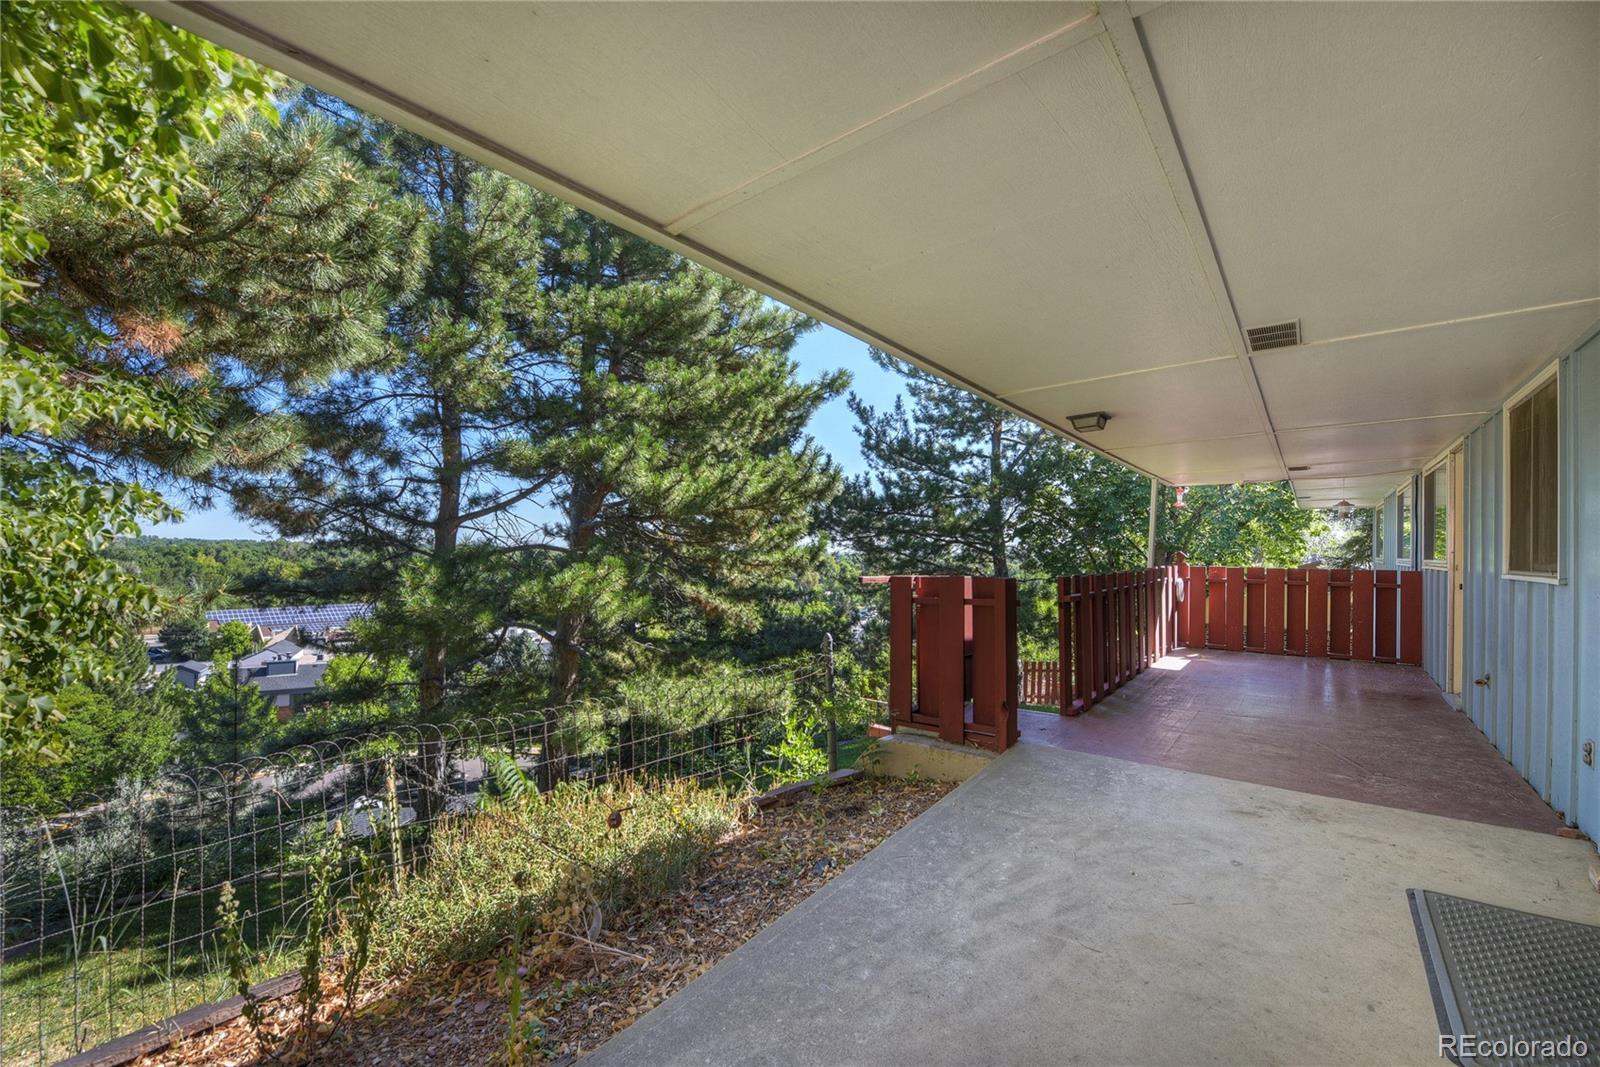 MLS# 3086362 - 39 - 2445 Balsam Drive, Boulder, CO 80304